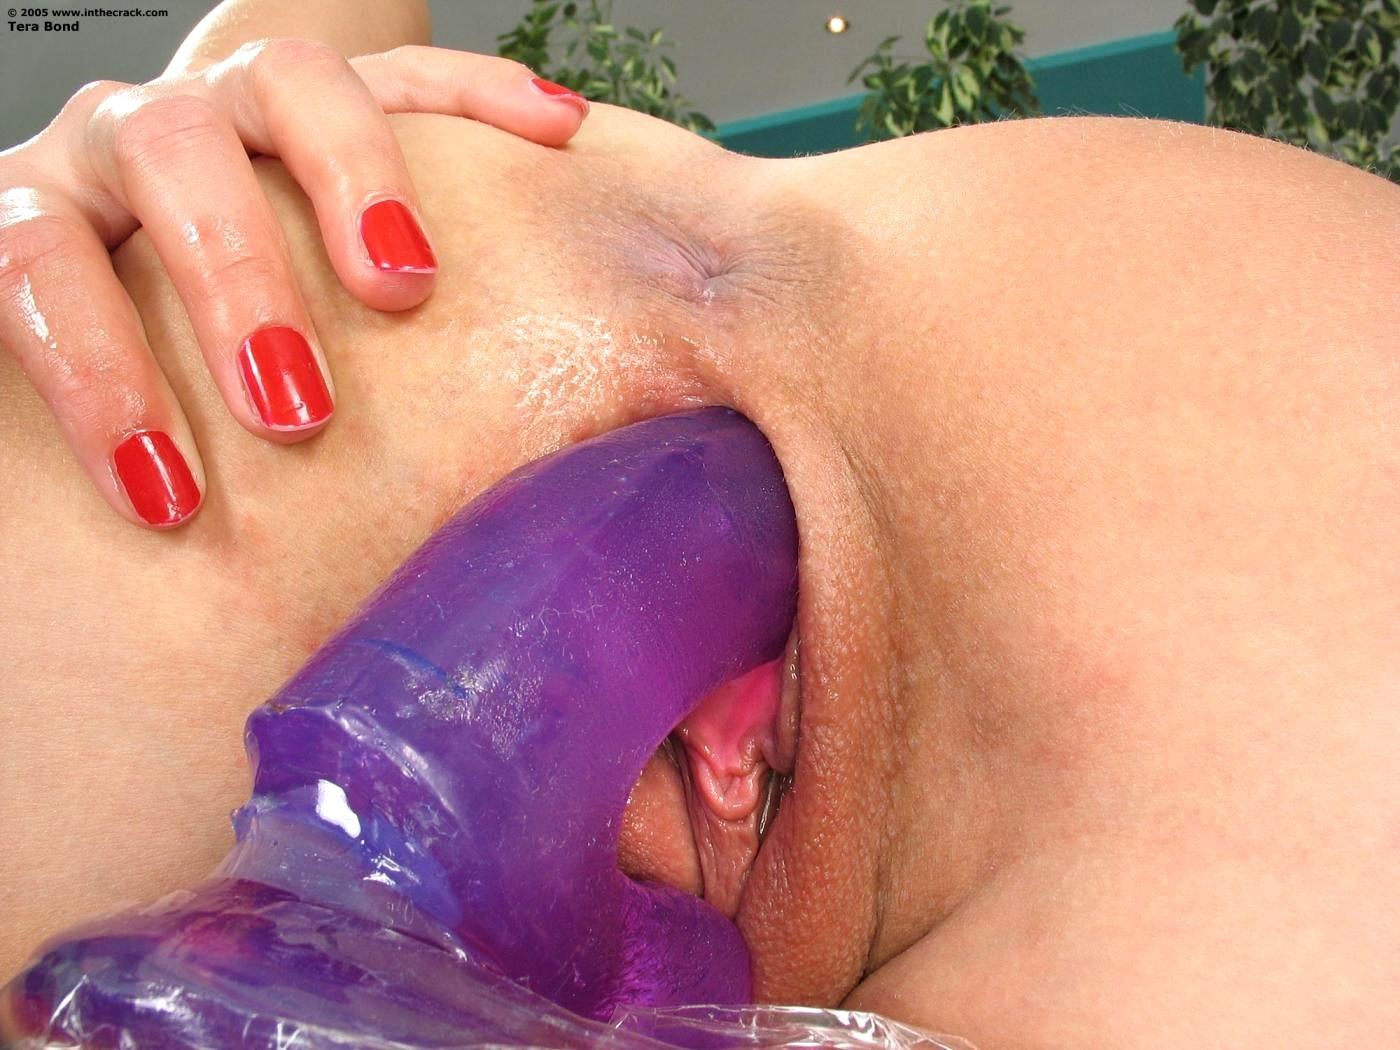 Seductive tera bond thrusts her dildo deep in her pussy